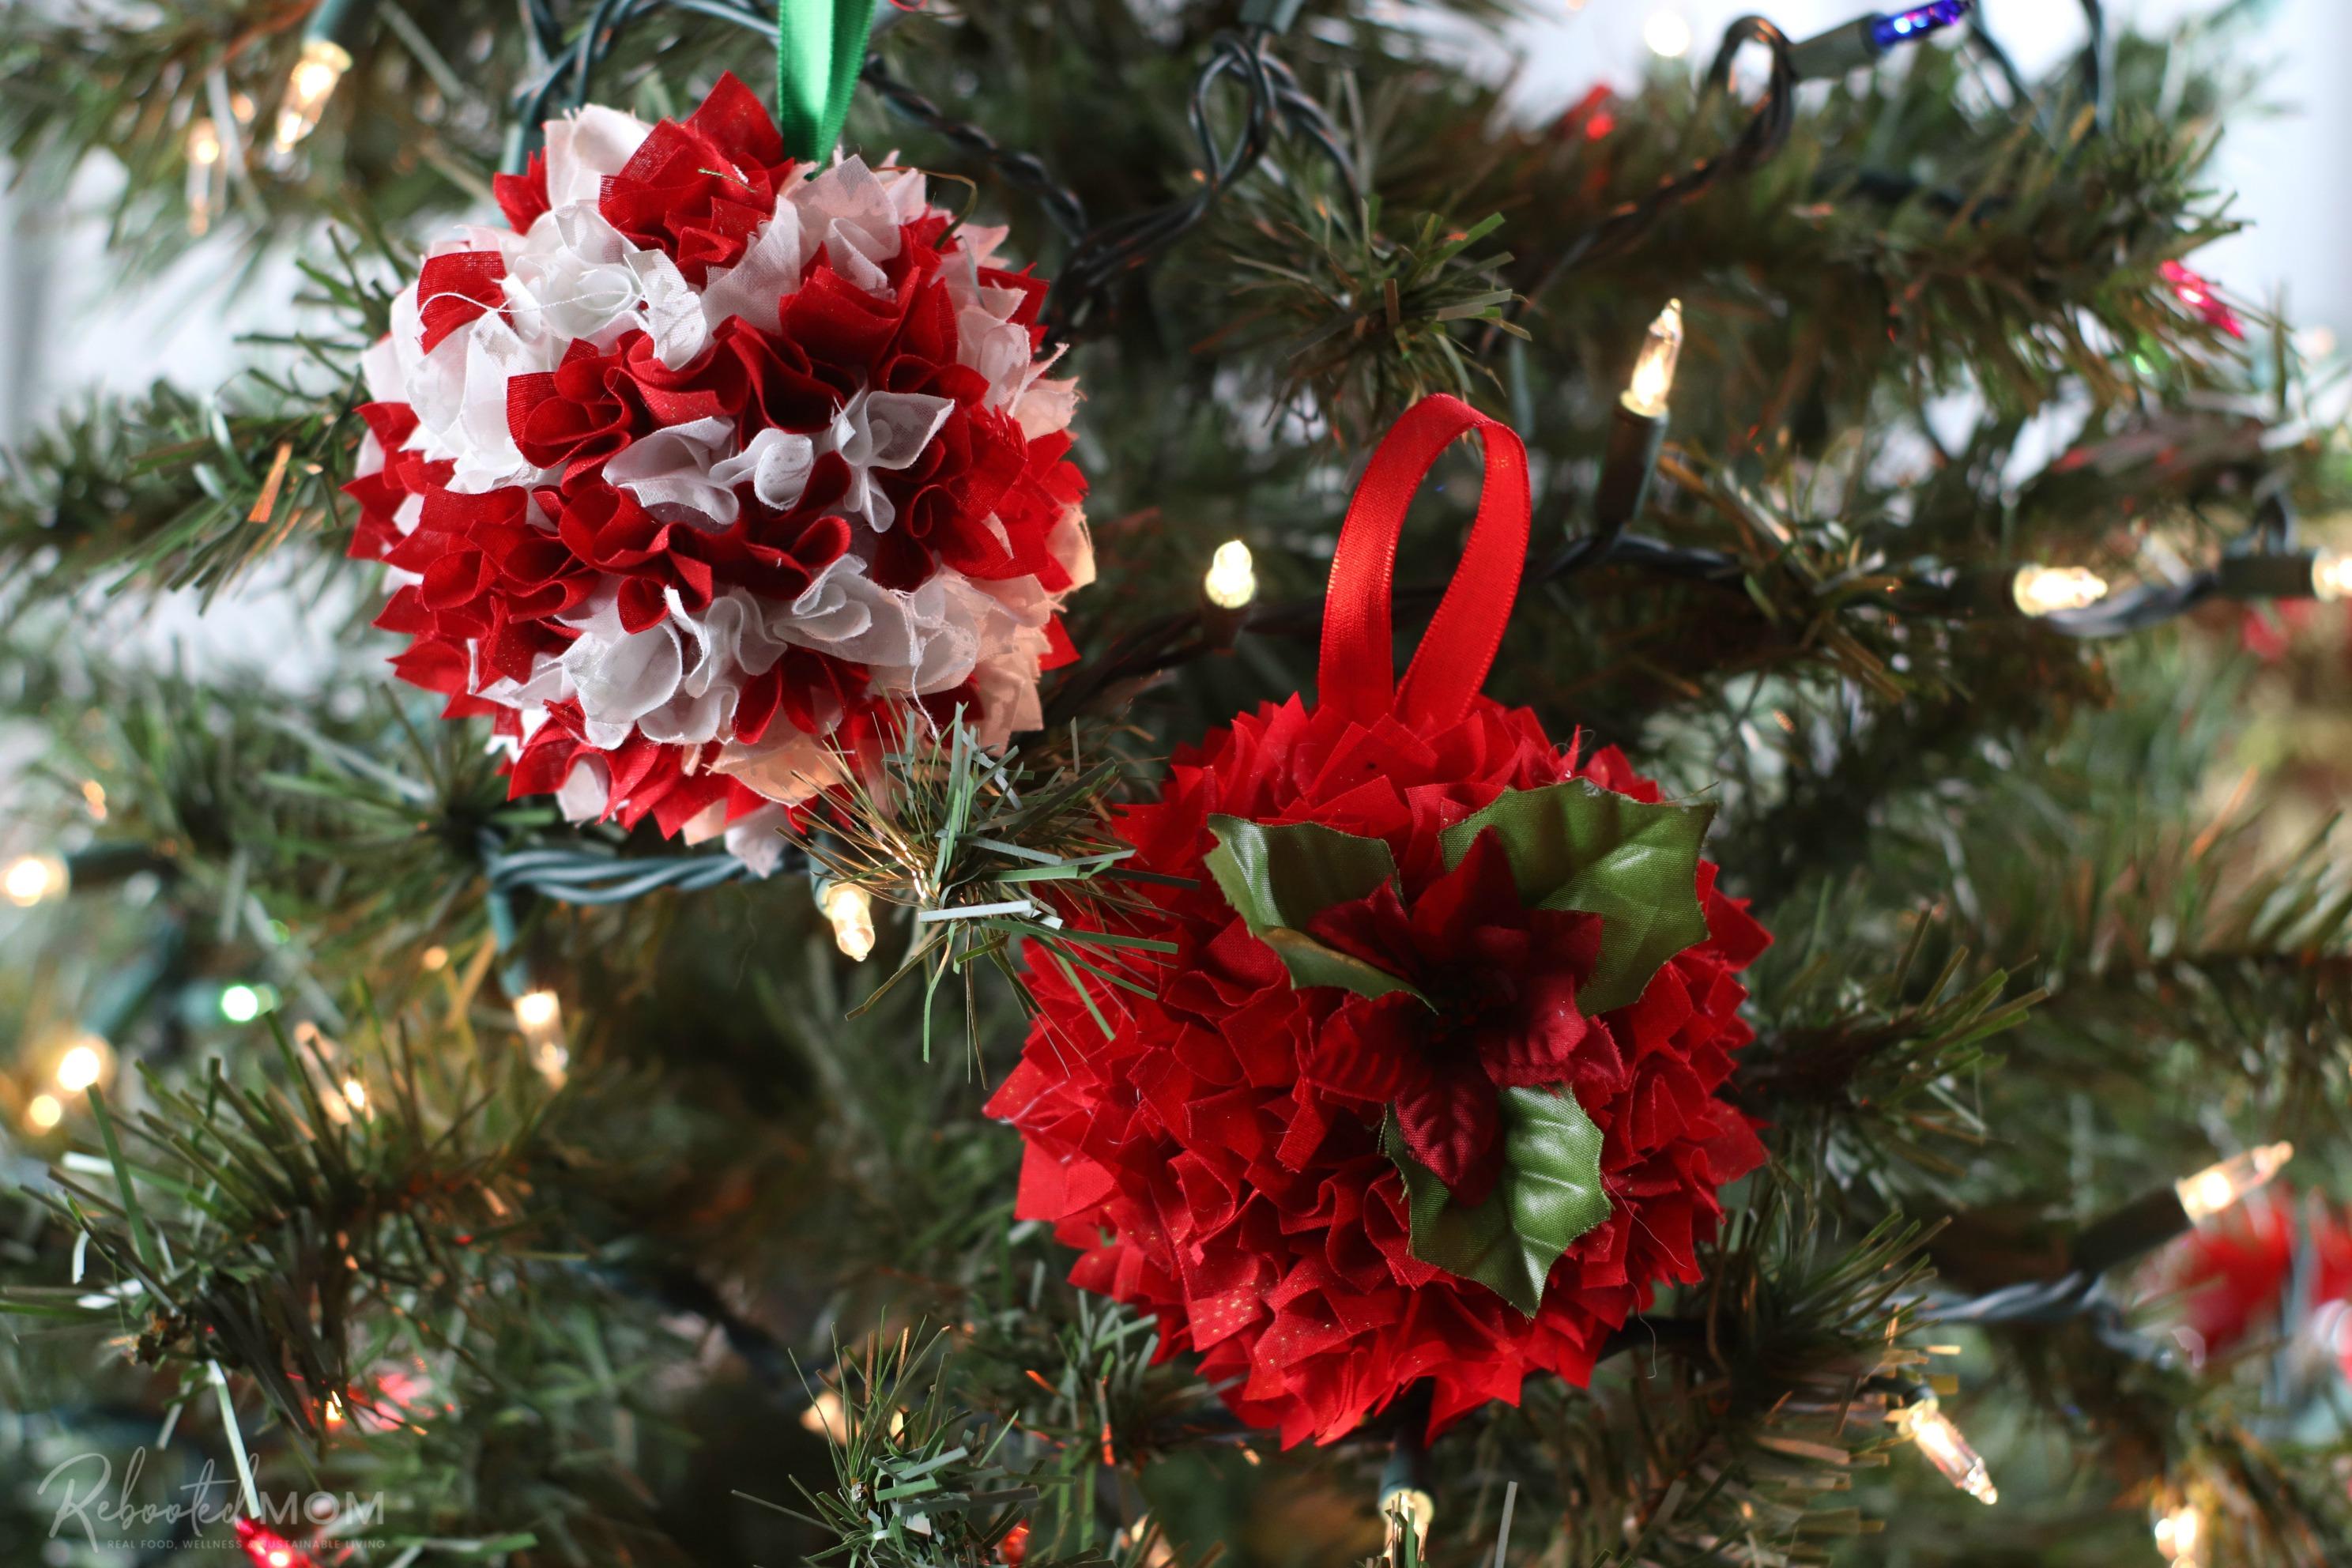 Foam Ball Fabric Scrap Ornaments